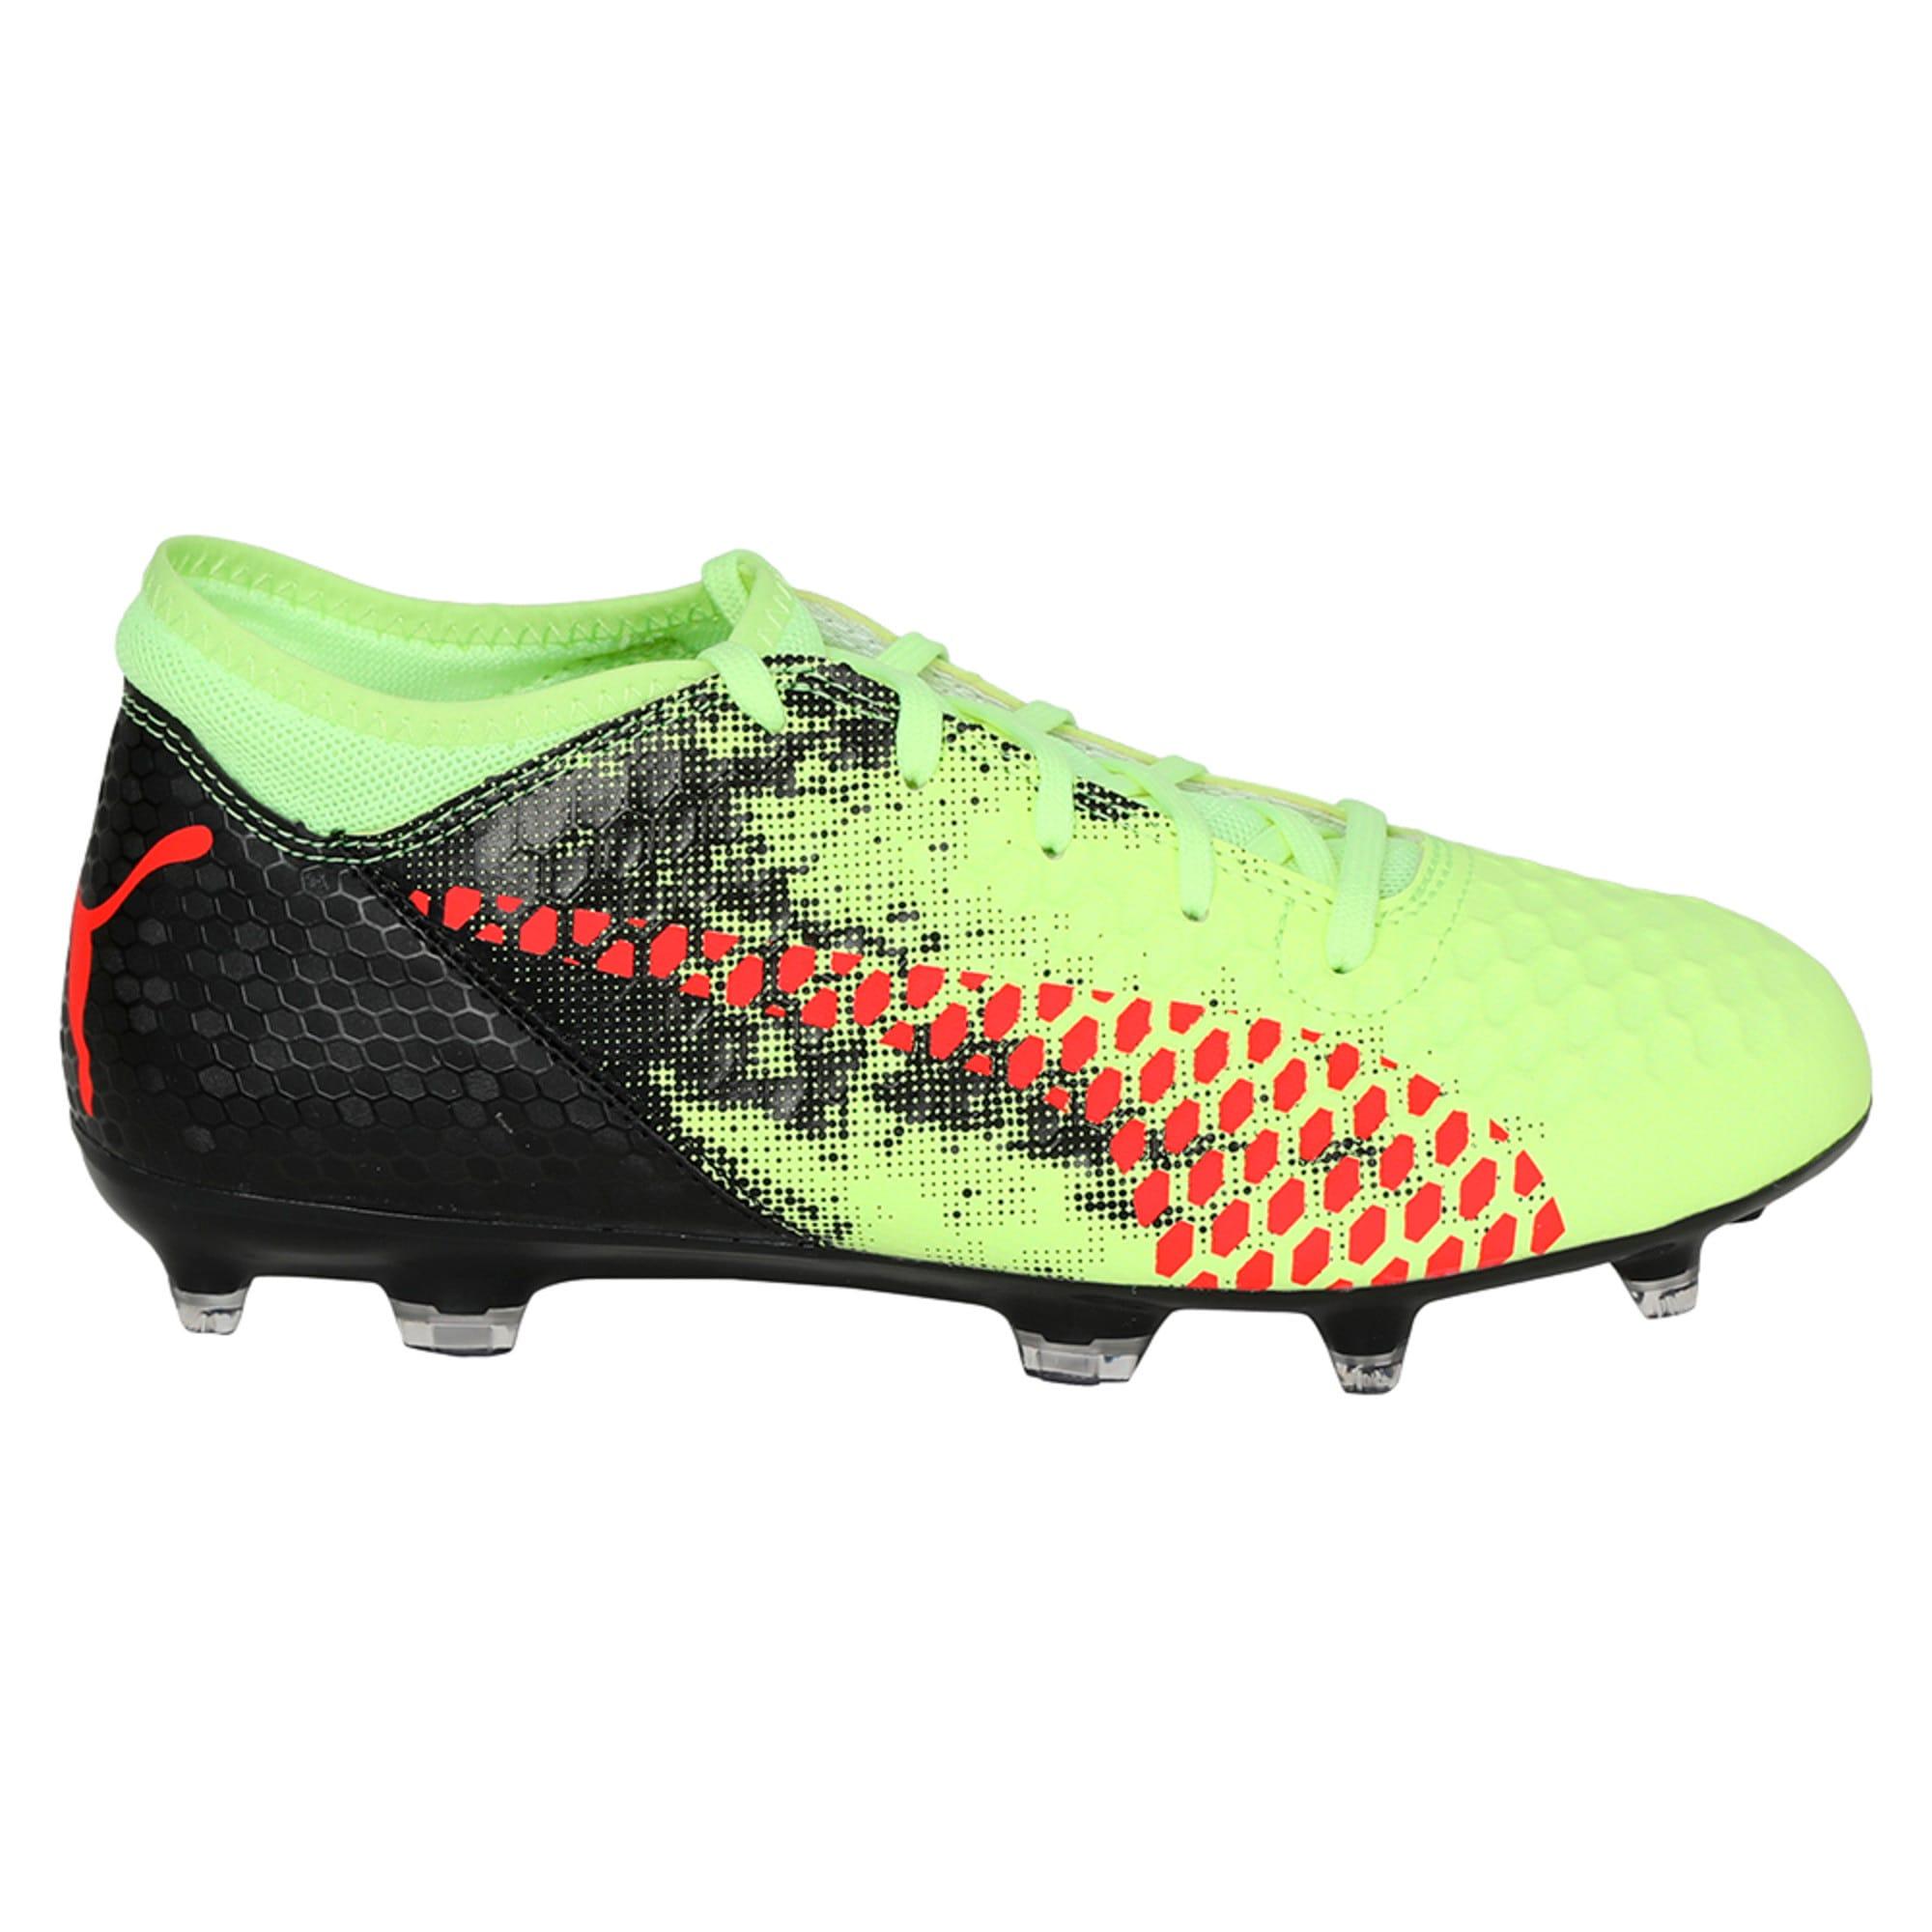 Thumbnail 5 of FUTURE 18.4 FG/AG Jr Football Boots, Yellow-Red-Black, medium-IND